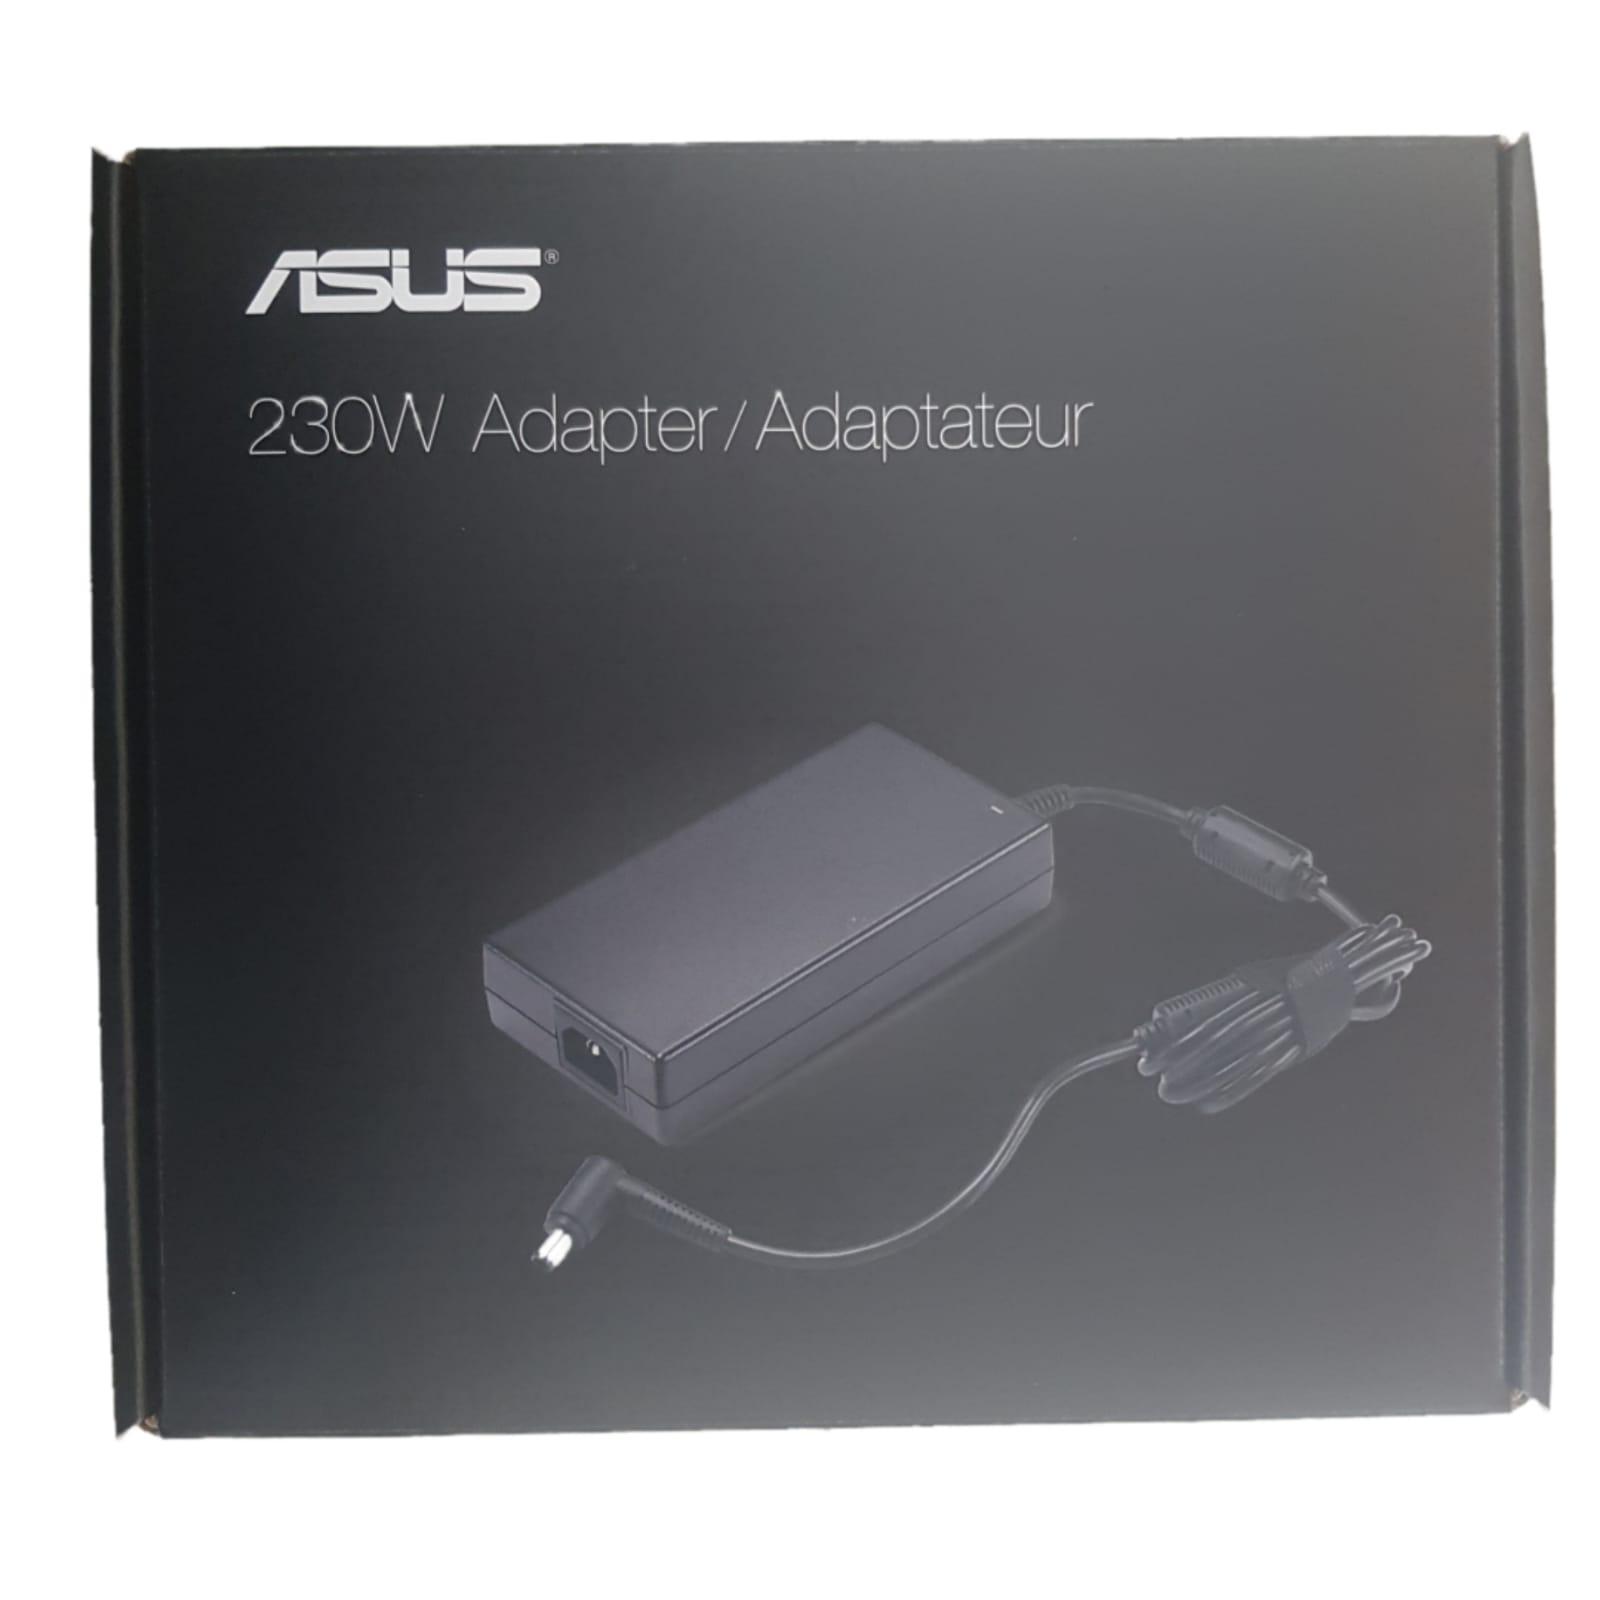 מטען למחשב נייד Asus GL504GW